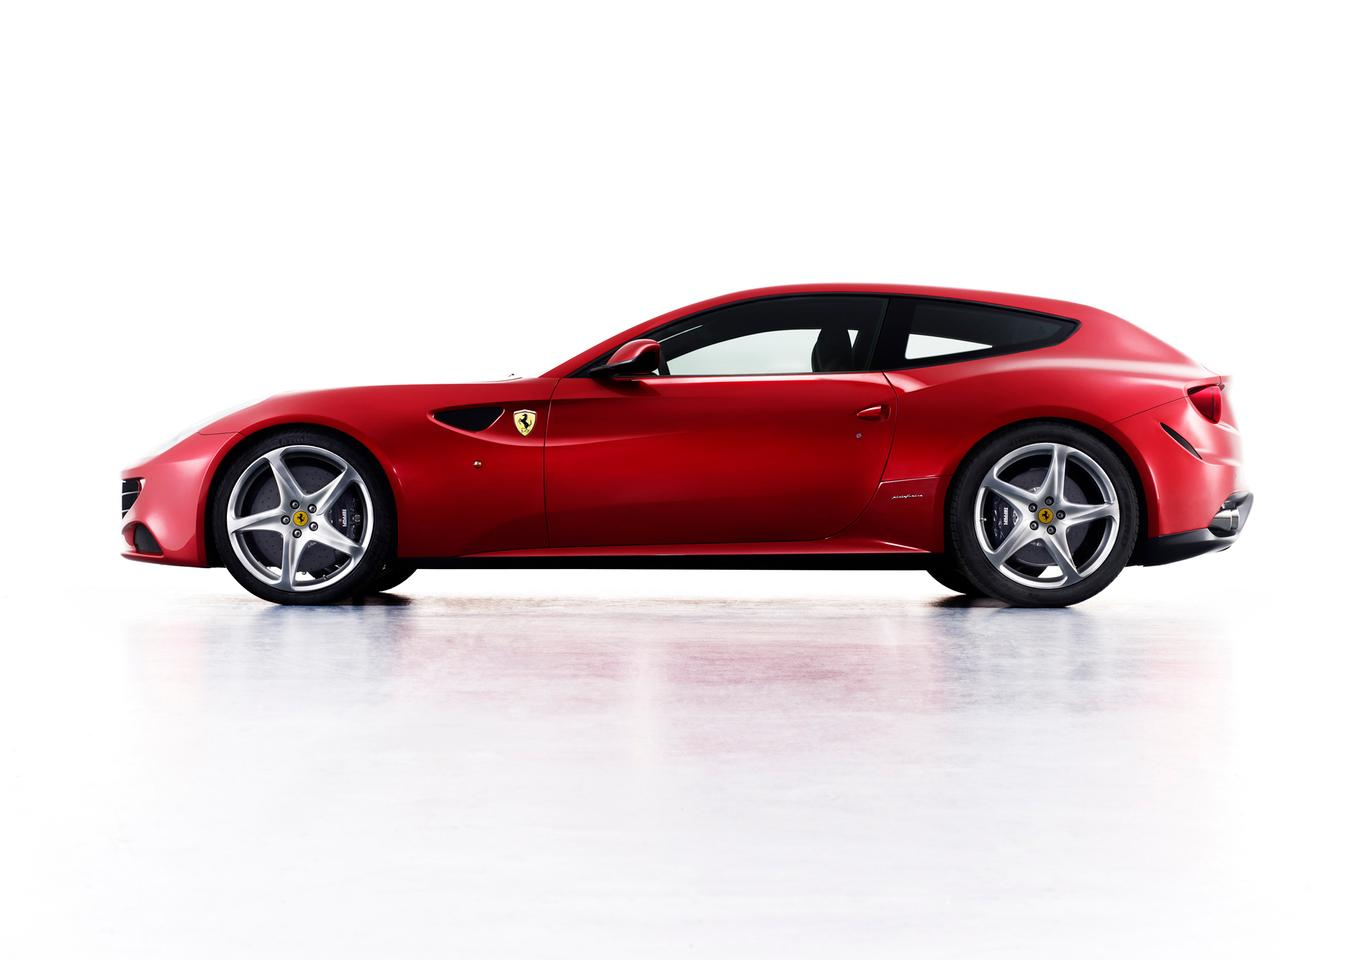 Ferrari's new four-seat, four-wheel-drive, 660 bhp V12 FF